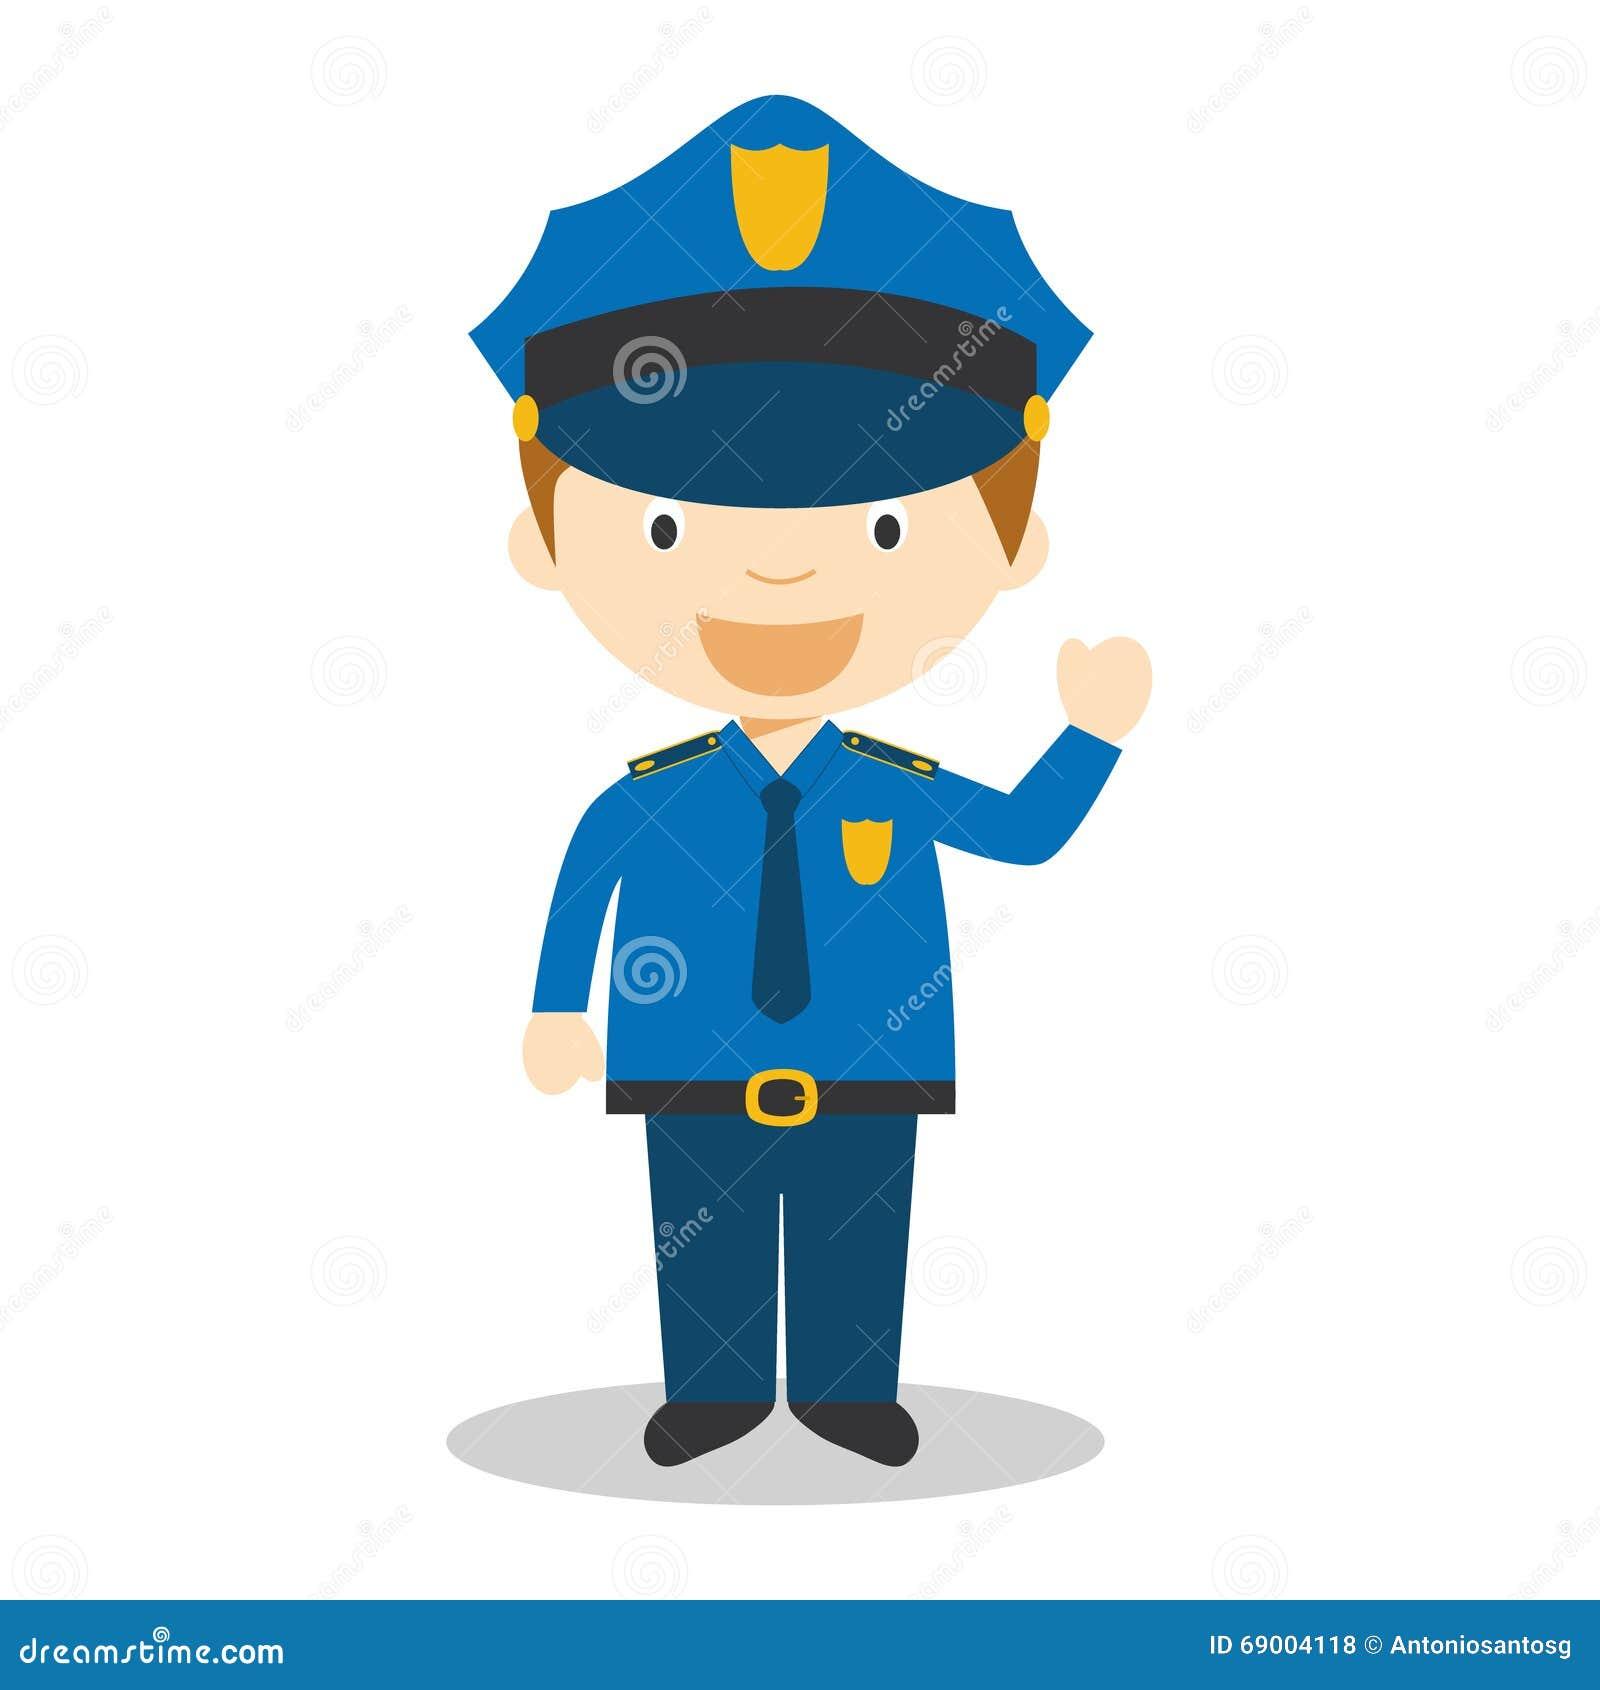 Cute Cartoon Vector Illustration Of A Policeman Stock